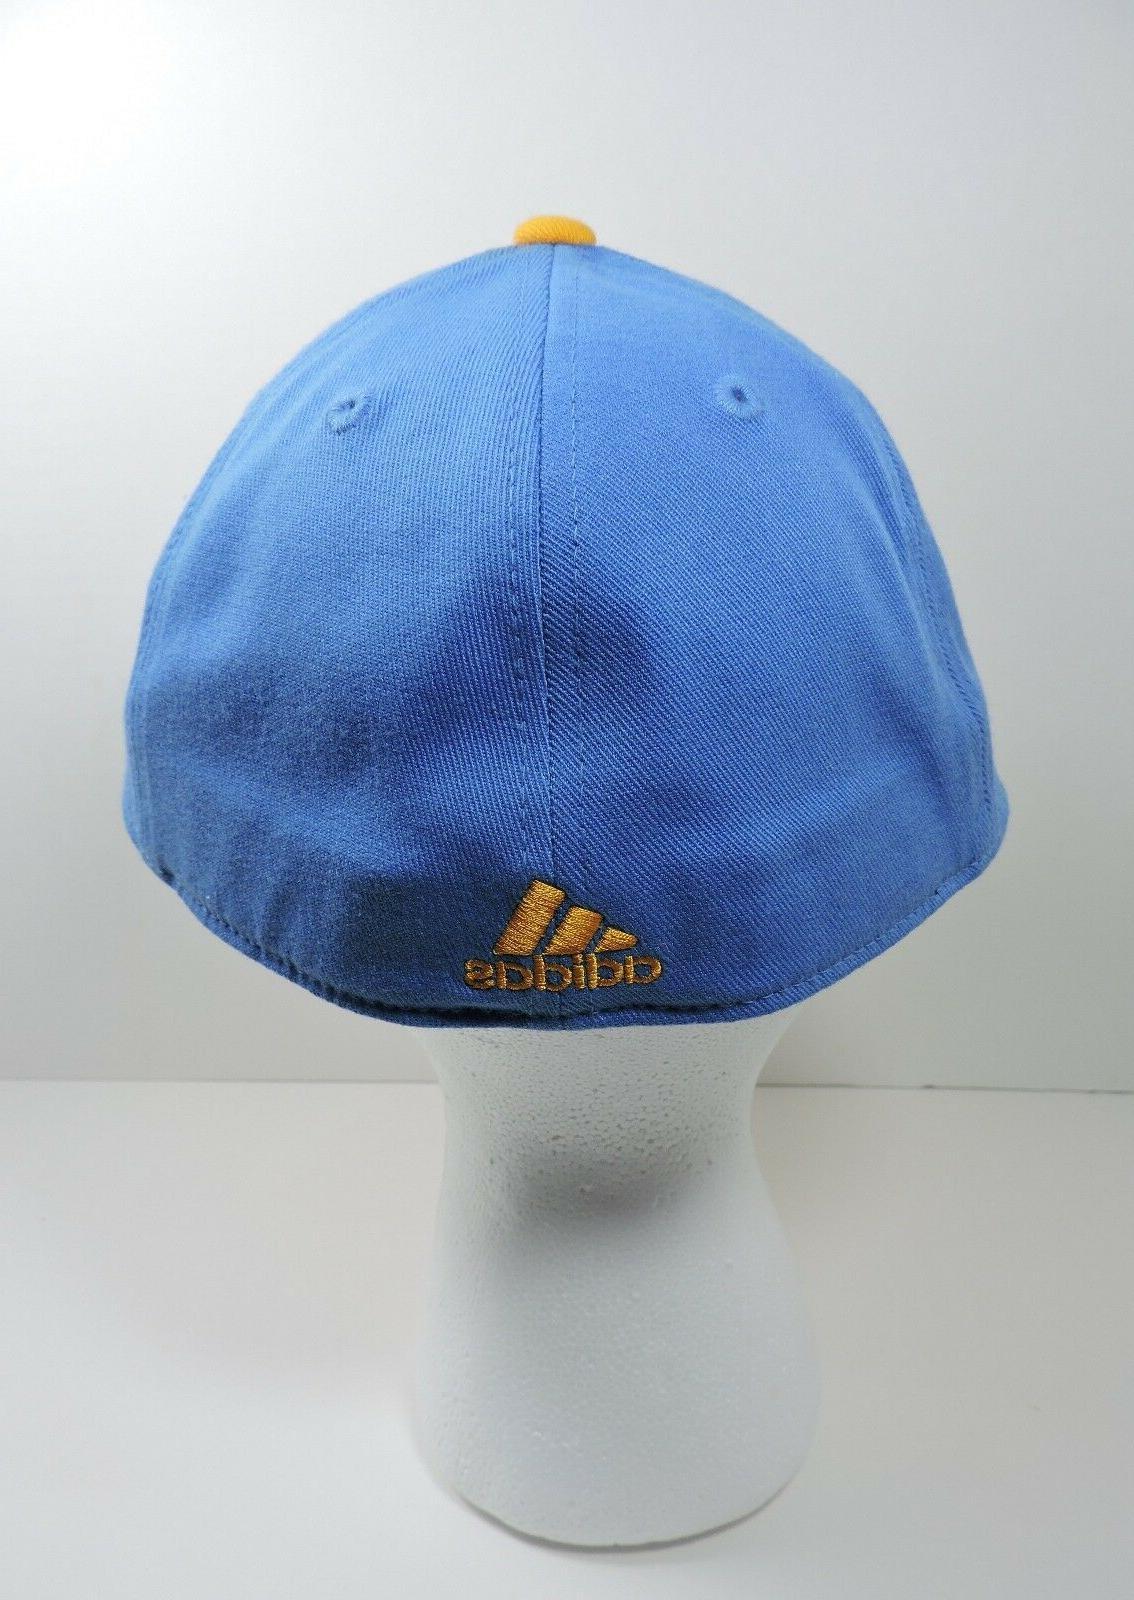 Adidas NBA Basketball Hat 7 5/8